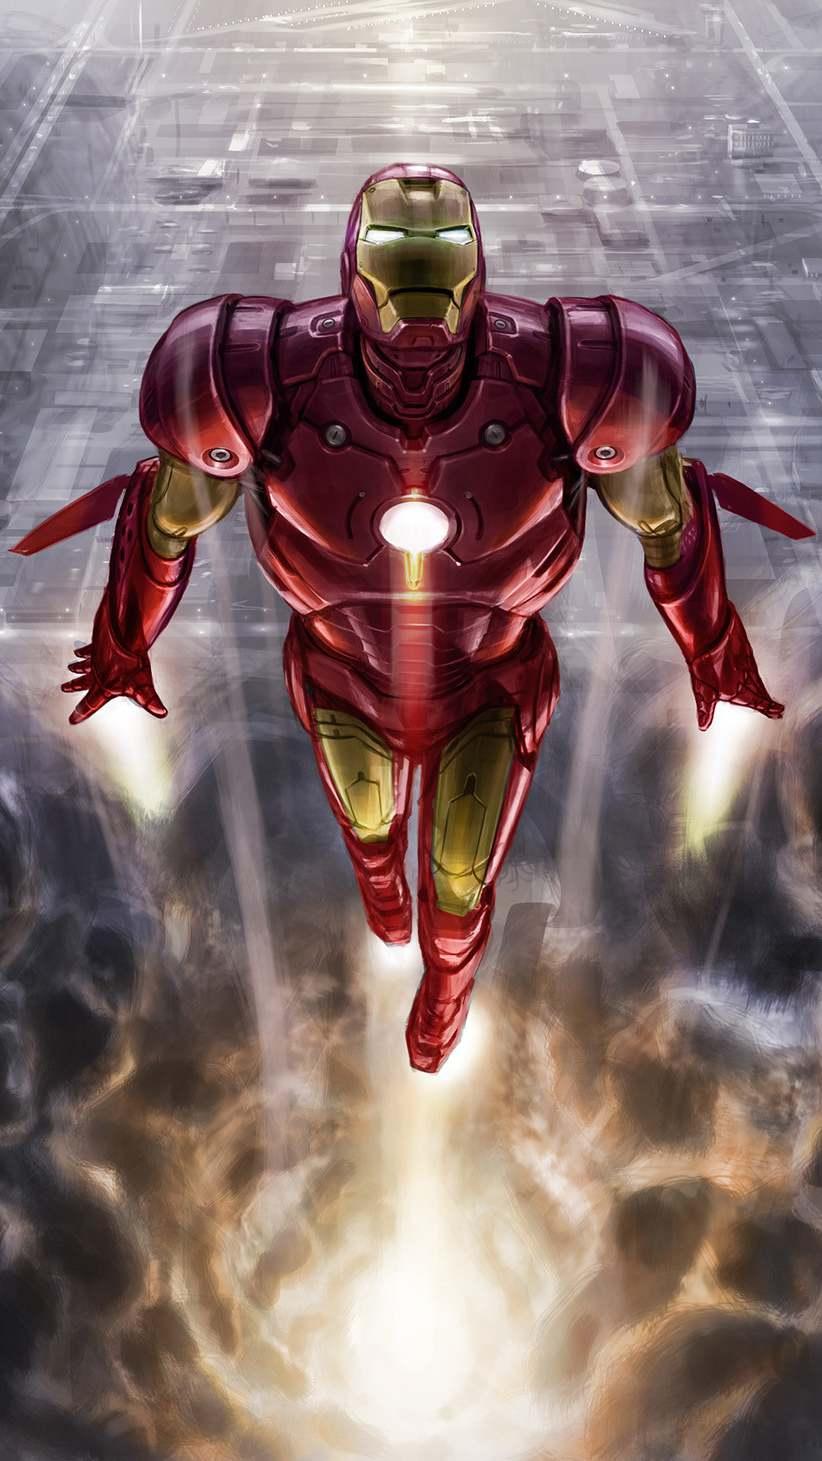 Iron Man Vertical Fly iPhone Wallpaper